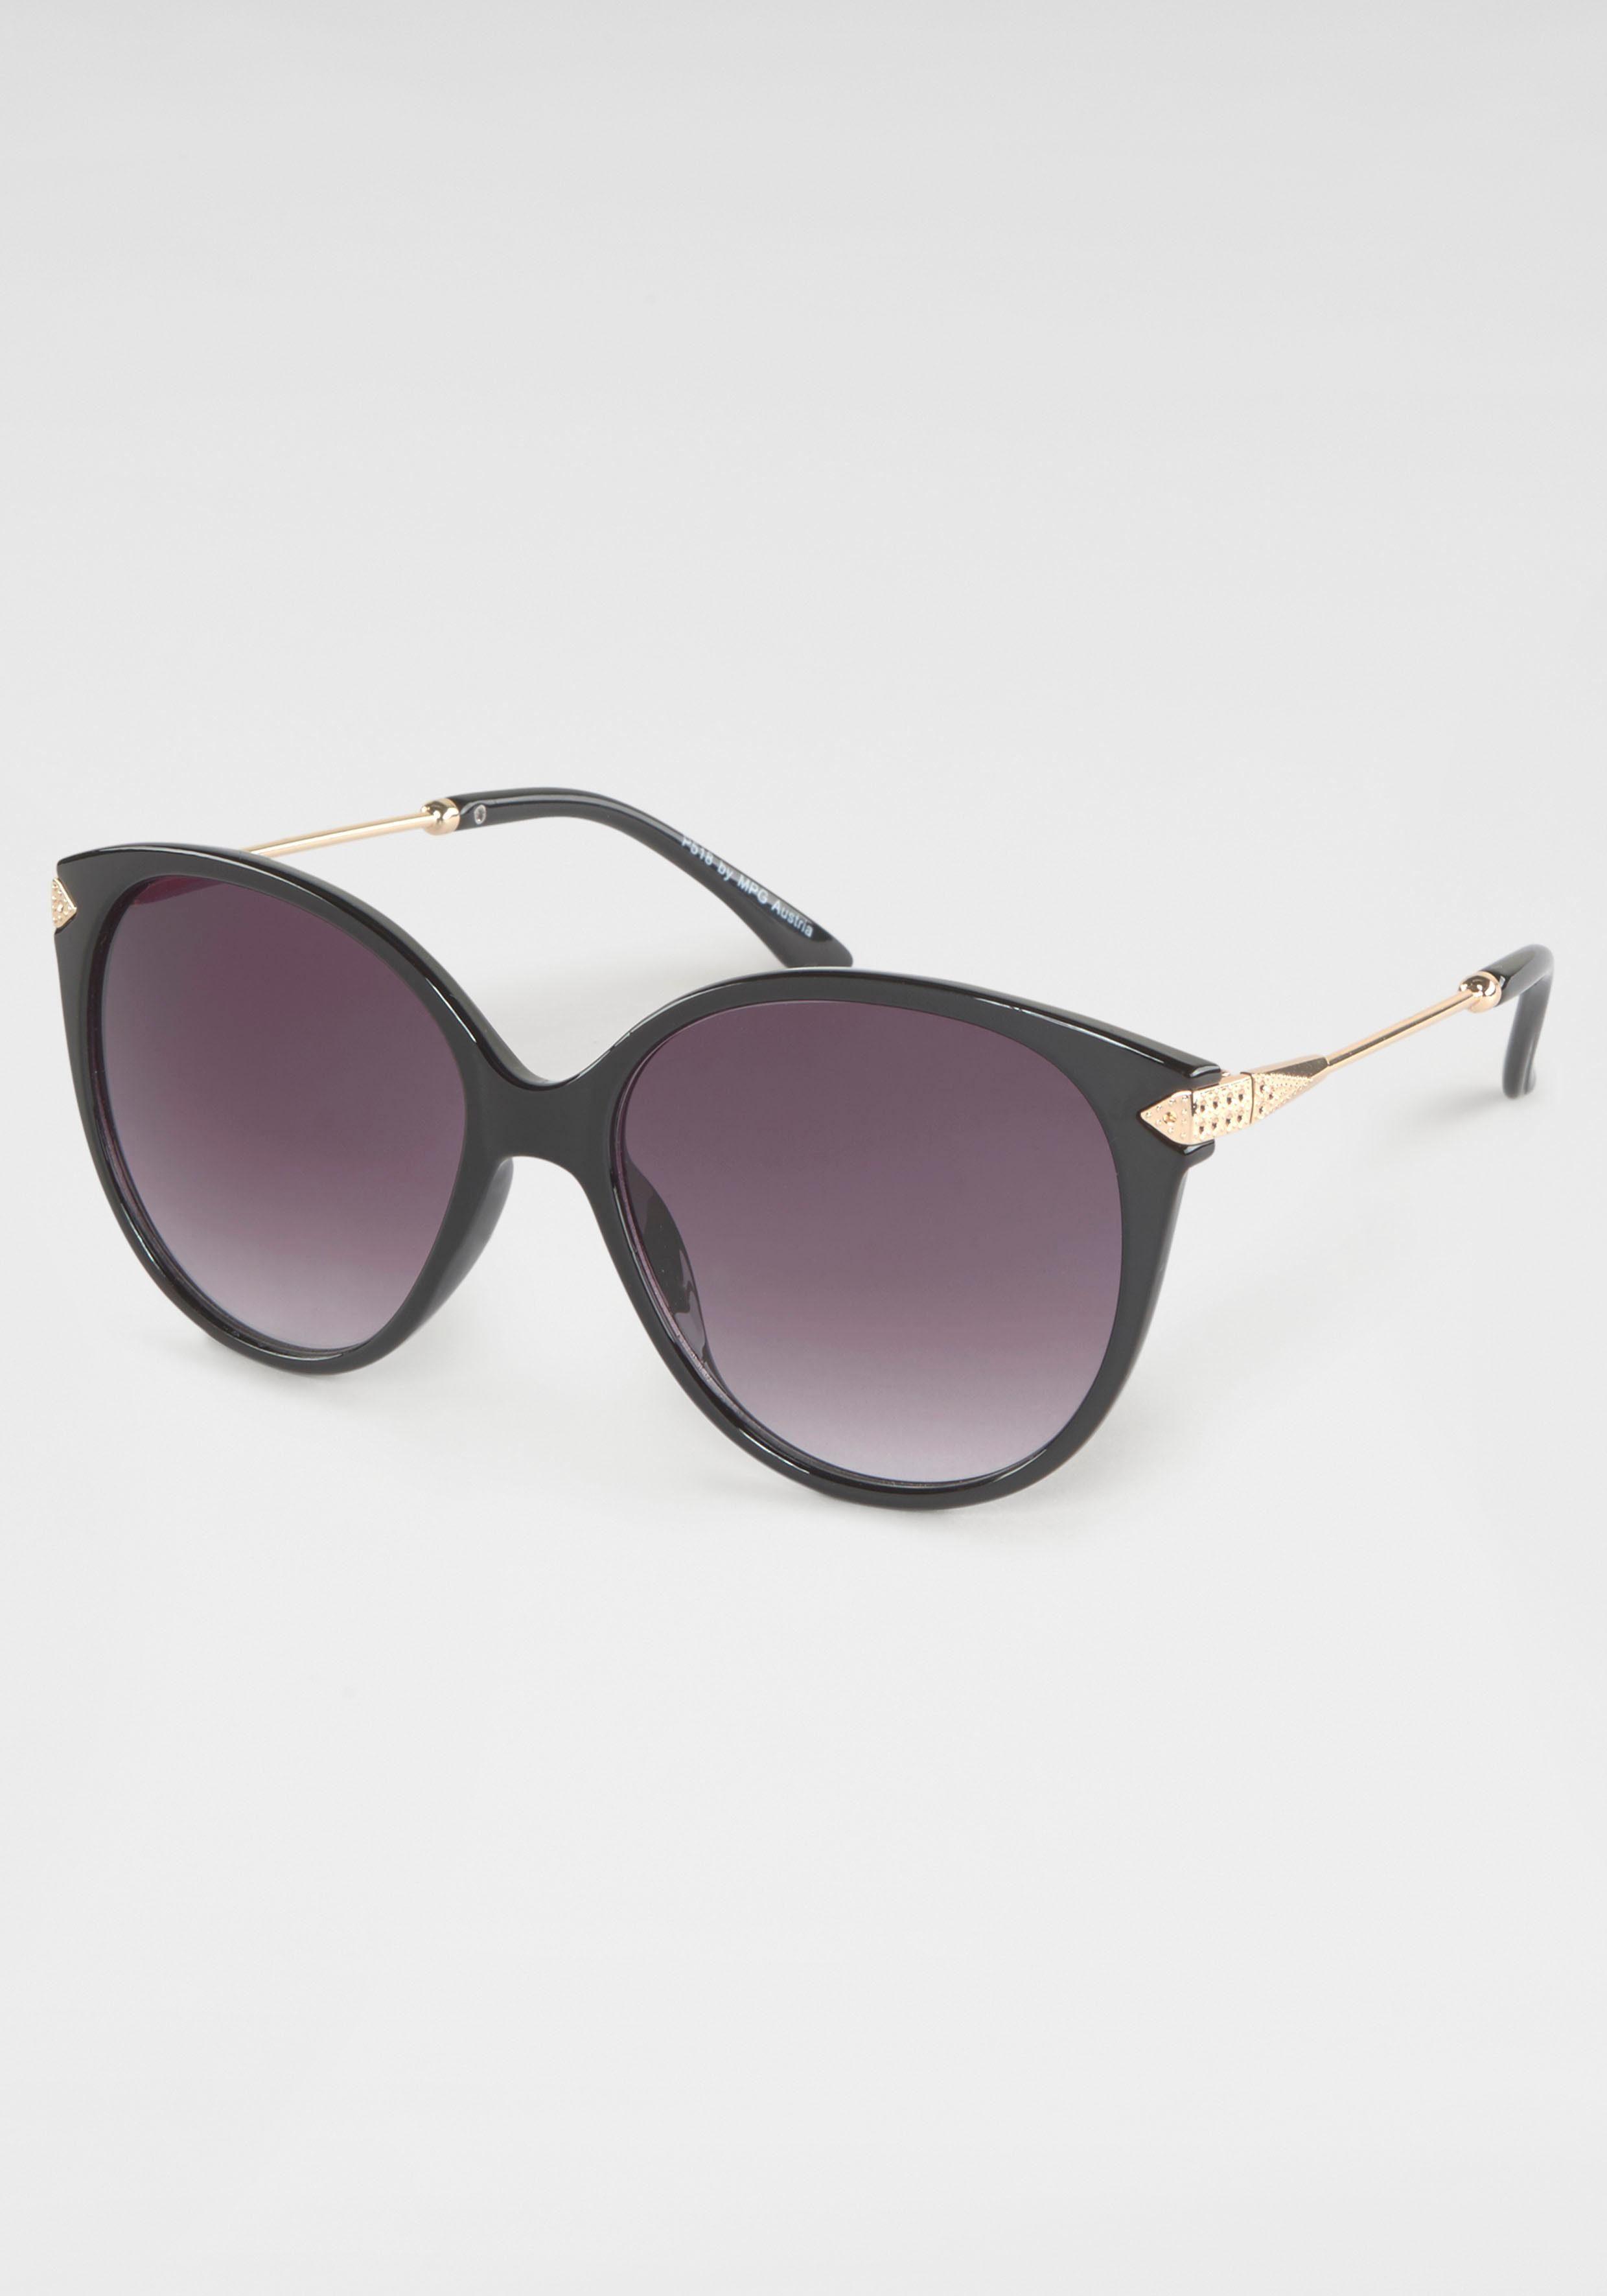 Sonnenbrille (1-St) Oversize, Retro-Look, Vollrand